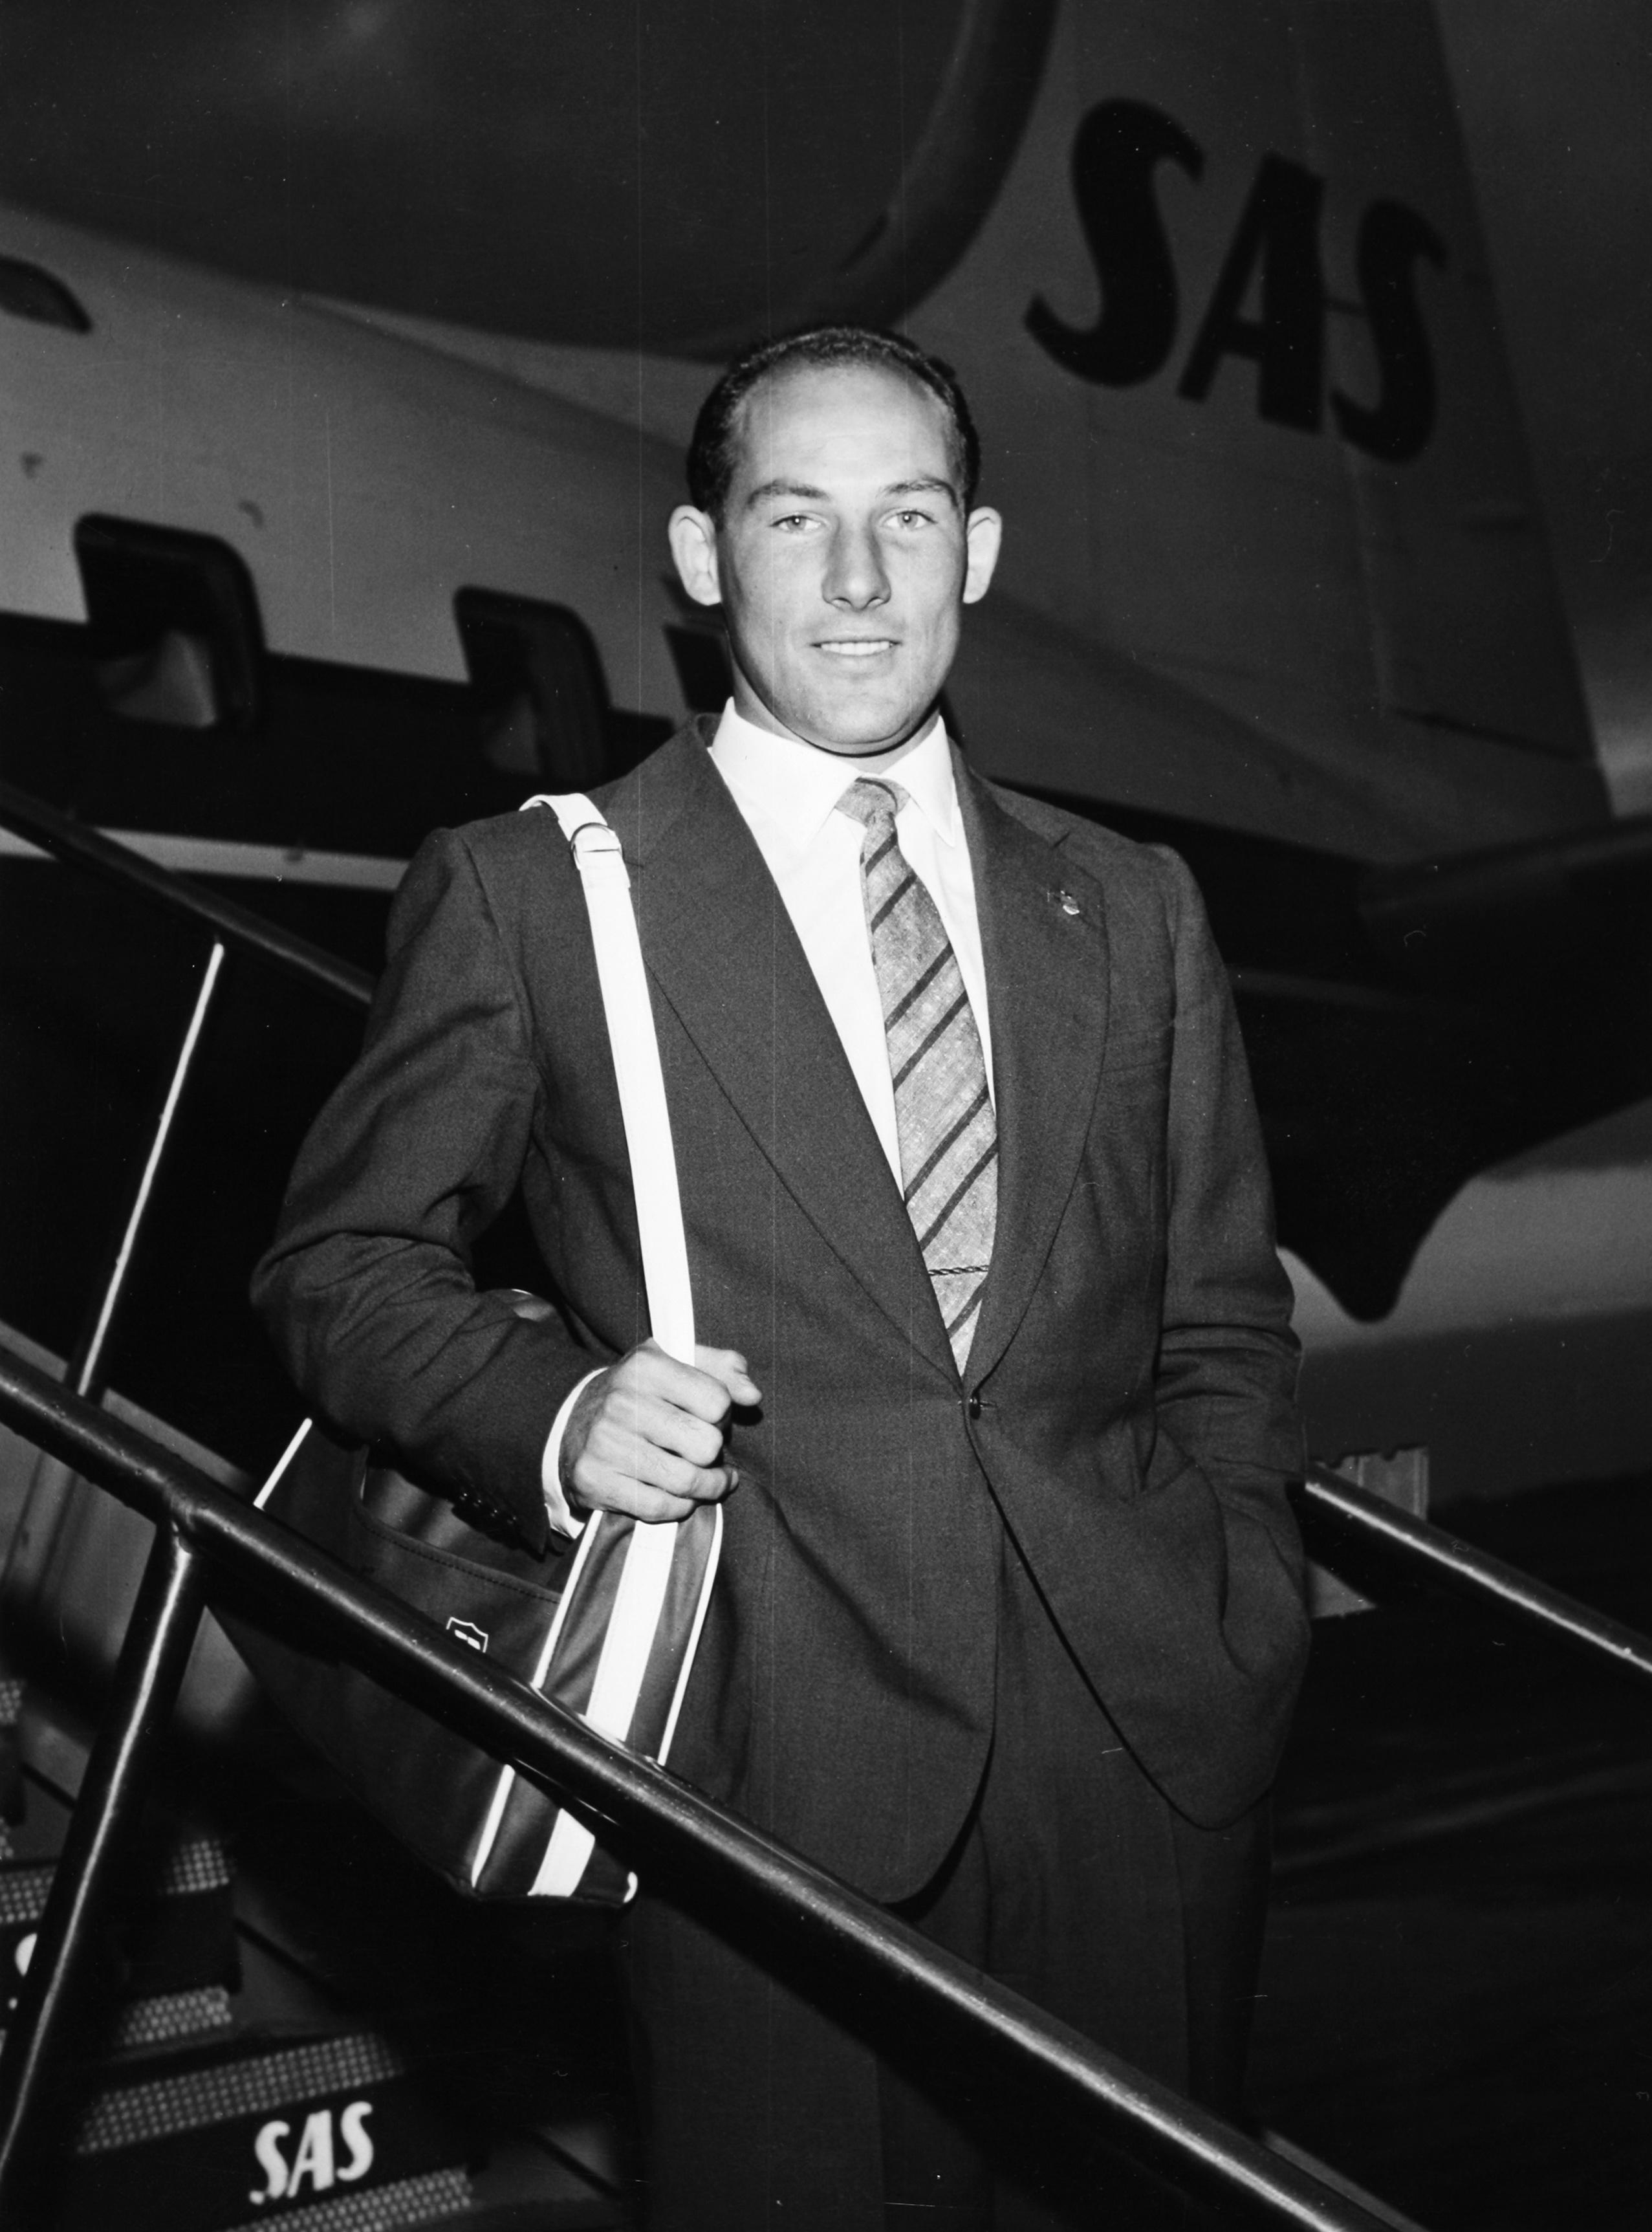 Verdens ubestridt beste racerfører fra 1958 til 1961: Stirling Moss. Foto: Daimler AG